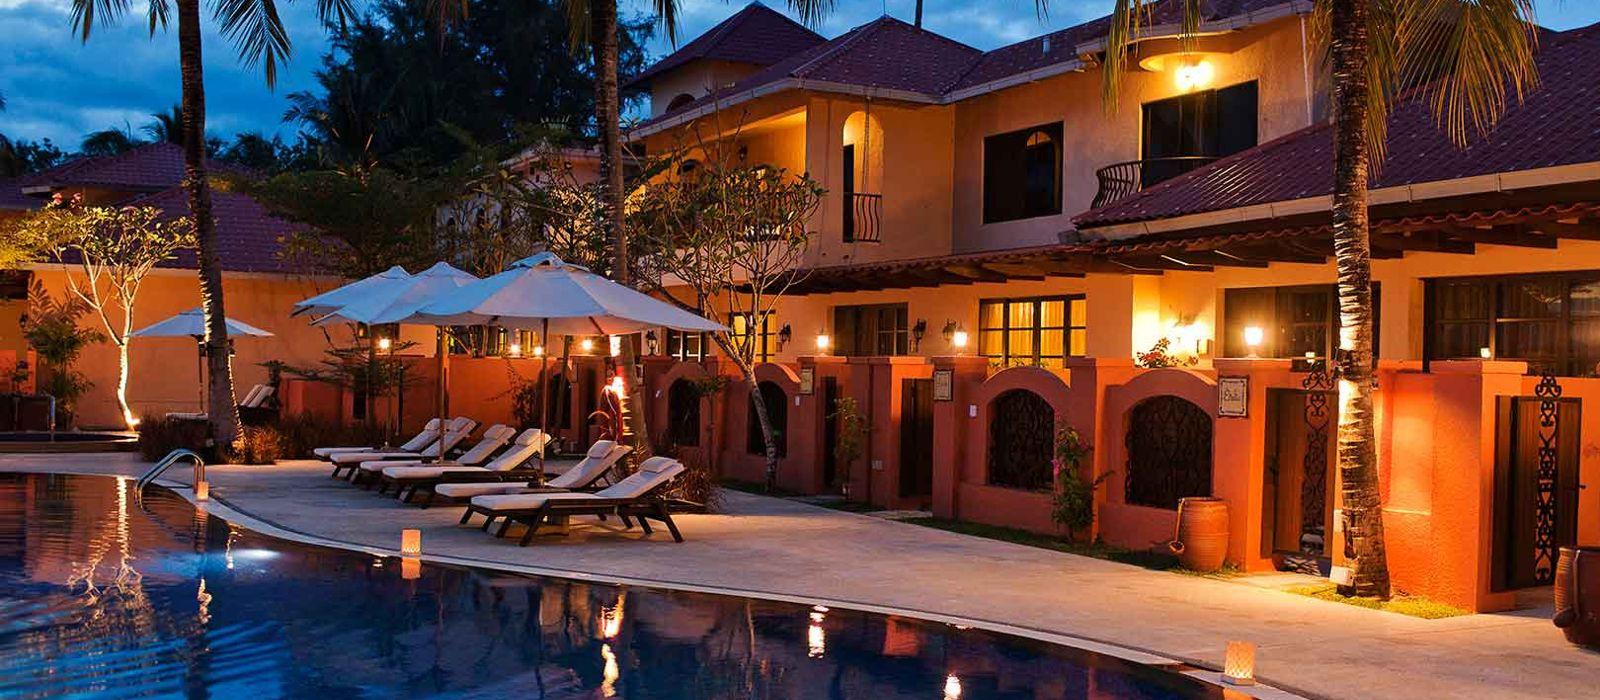 Hotel Casa del Mar Langkawi Malaysia